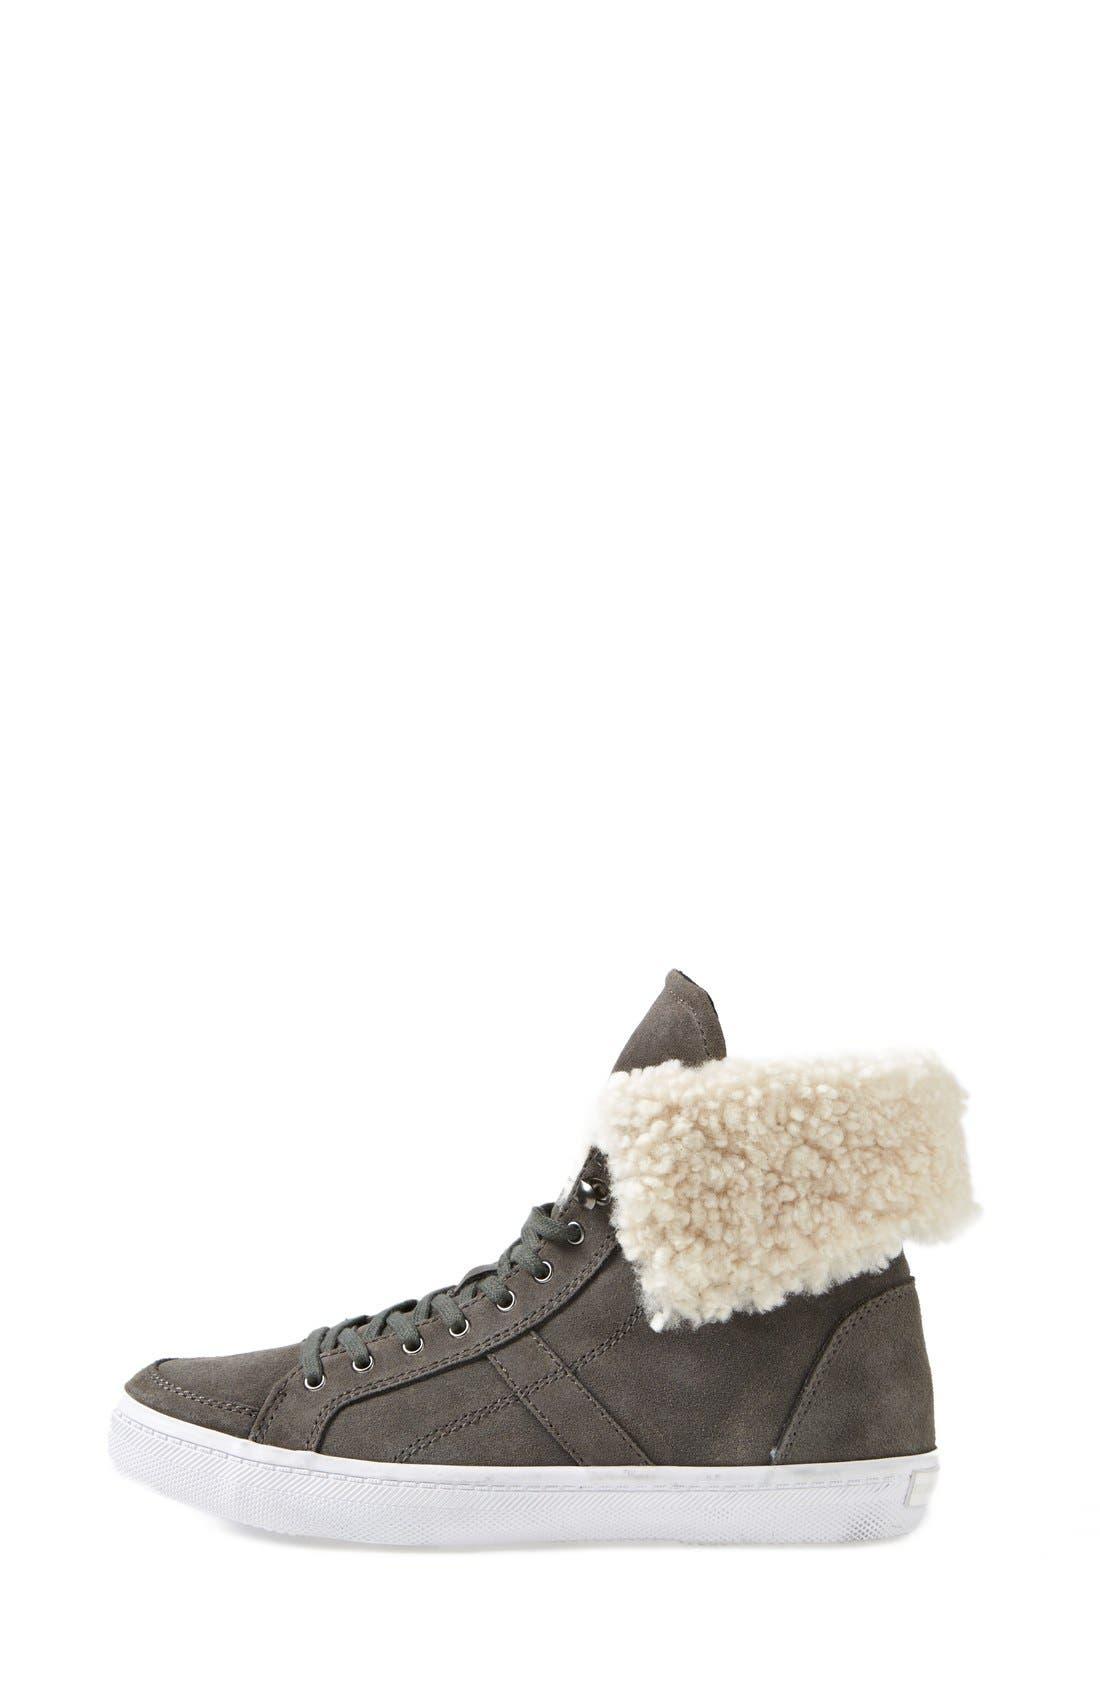 REBECCA MINKOFF,                             'Sasha' Suede High Top Sneaker,                             Alternate thumbnail 4, color,                             020